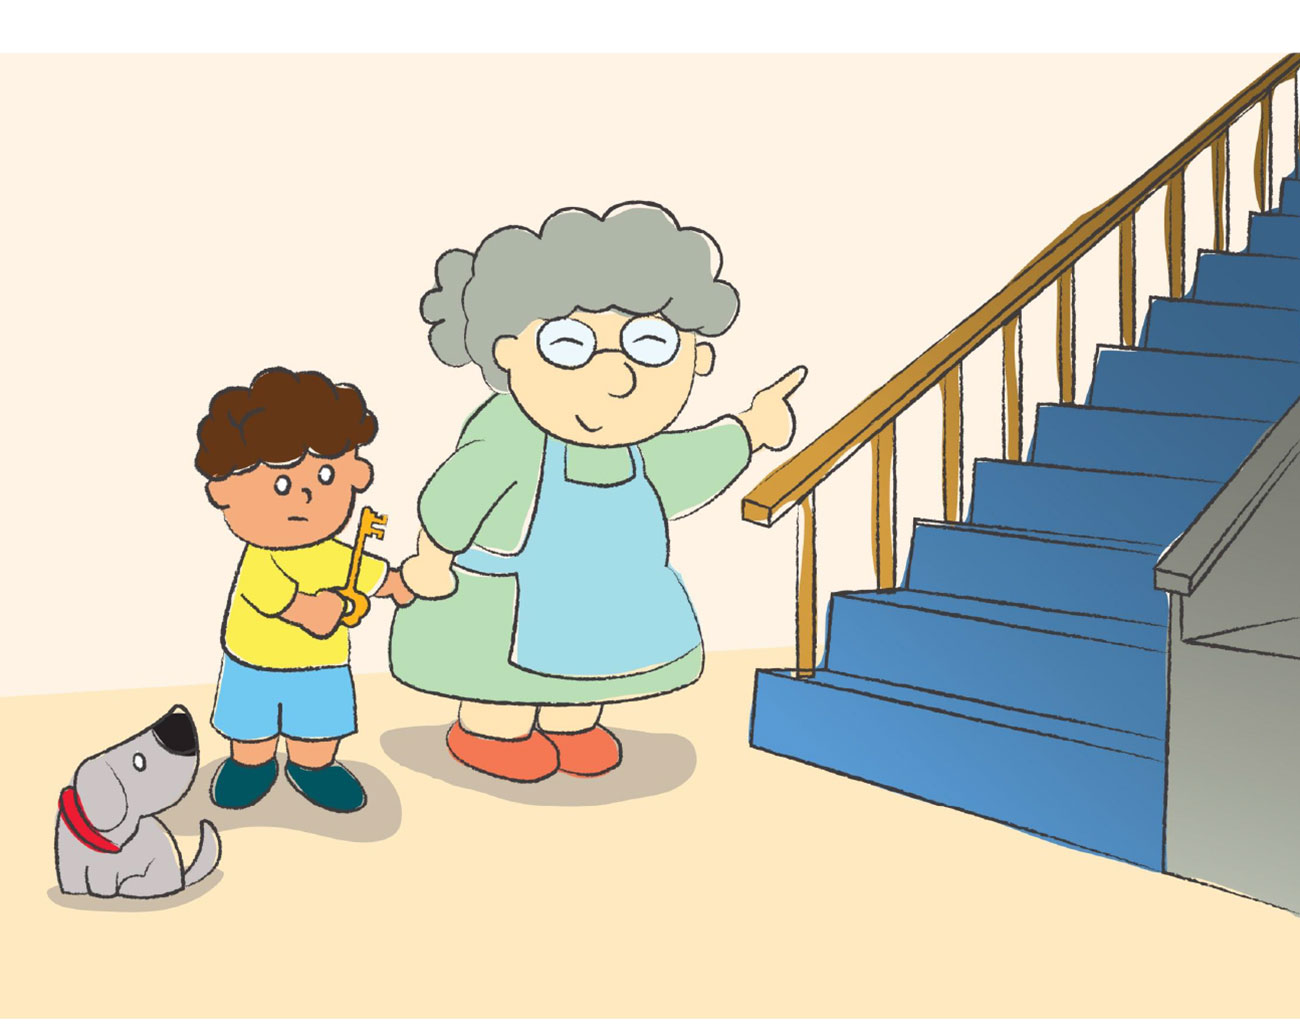 kids short story 'Down the memory lane with nash' by uma bala devarakonda - page 9